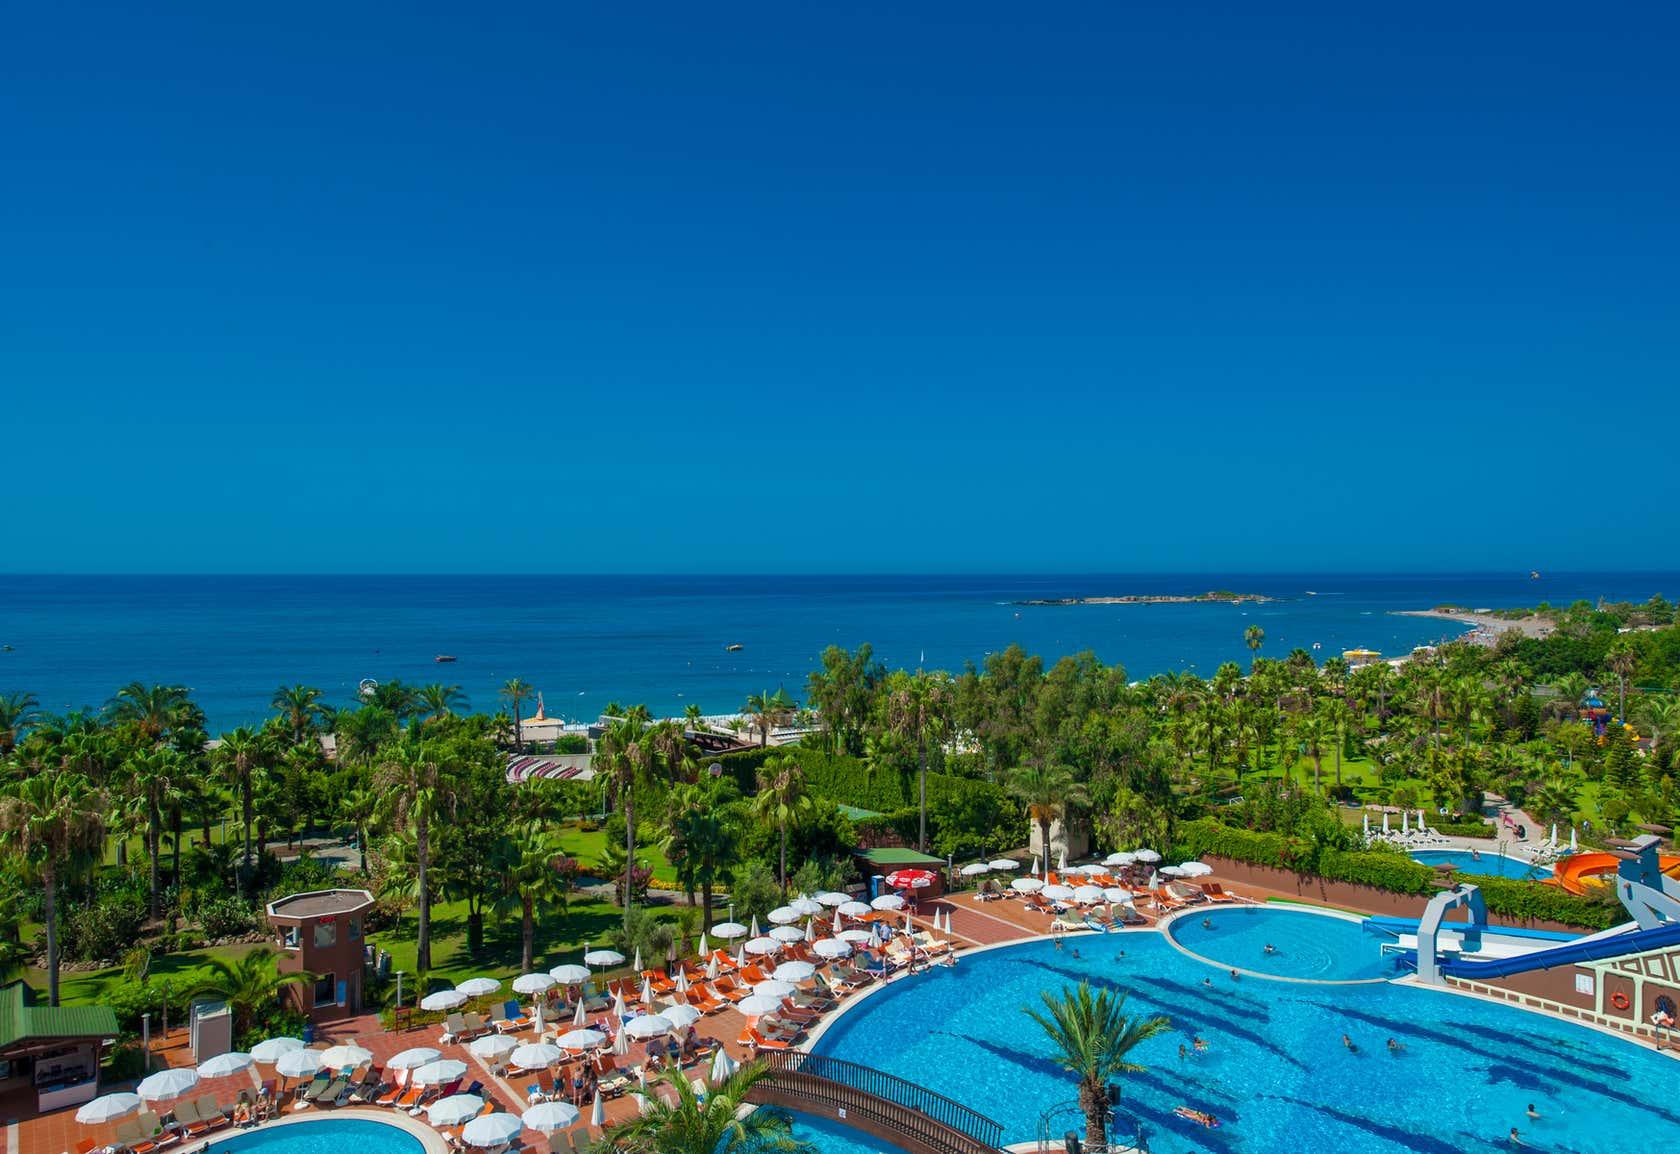 Kirman Leodikya Resort - All Inclusive